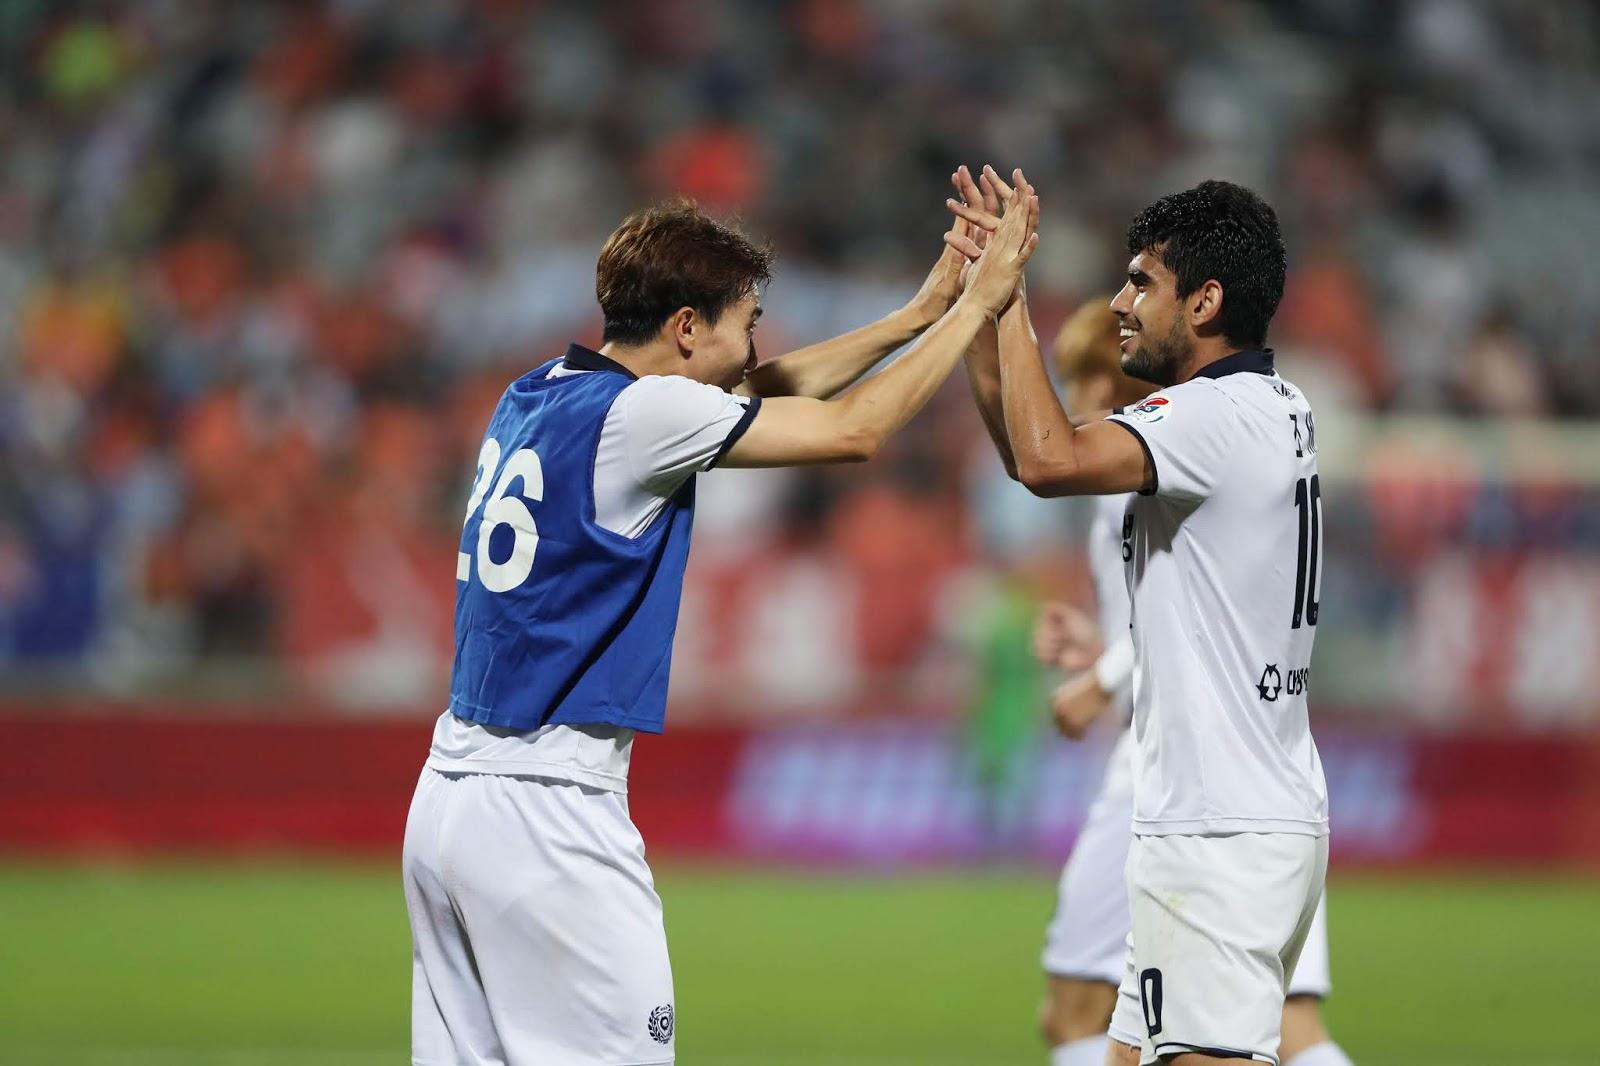 Preview: Daegu FC Vs Yangpyeong FC FA Cup